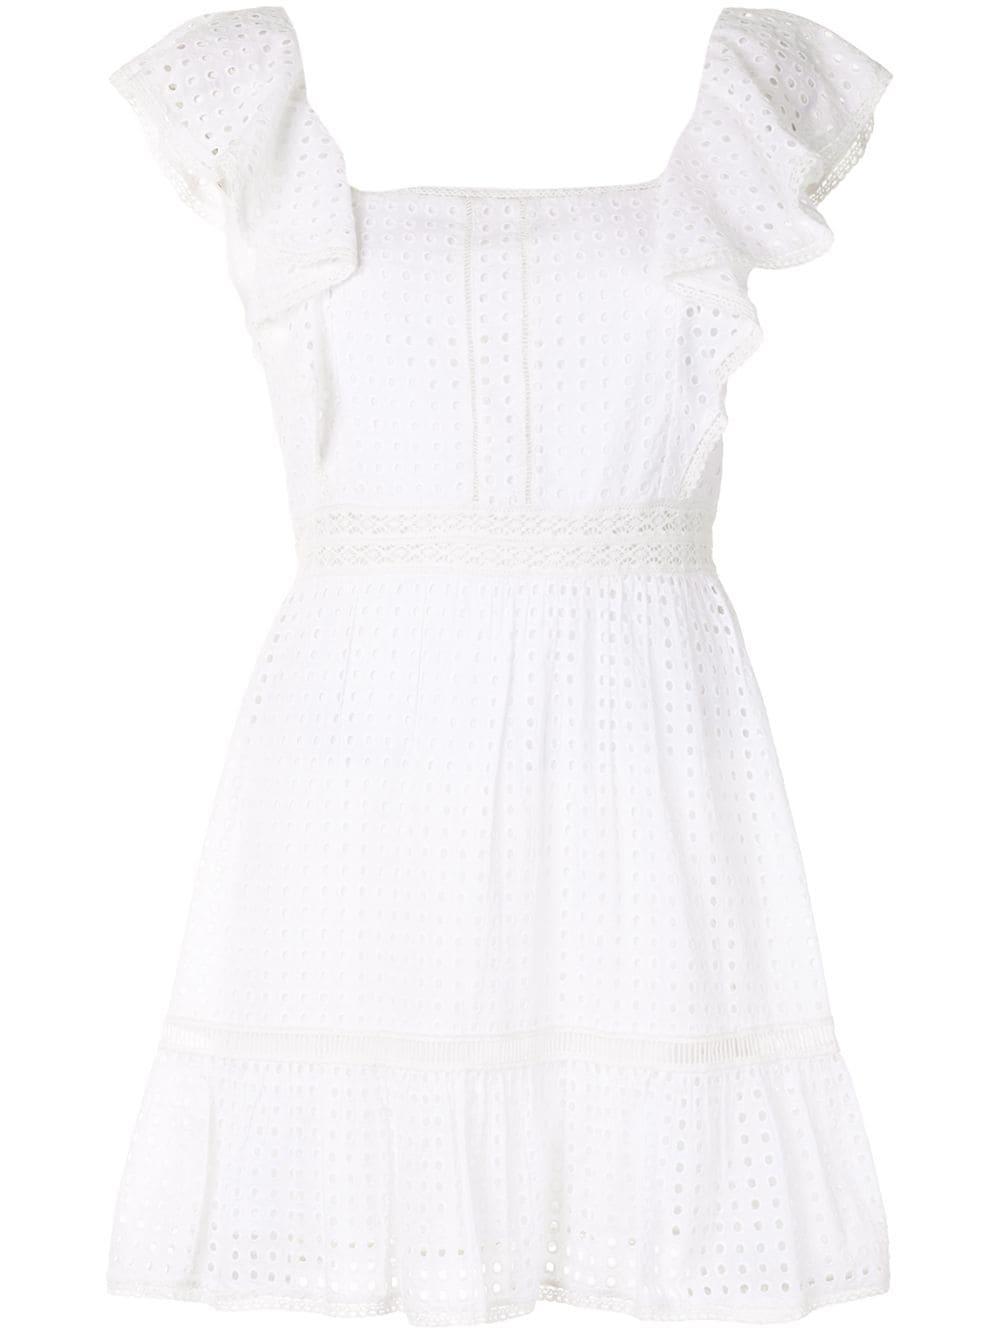 Remada Button Front Dress